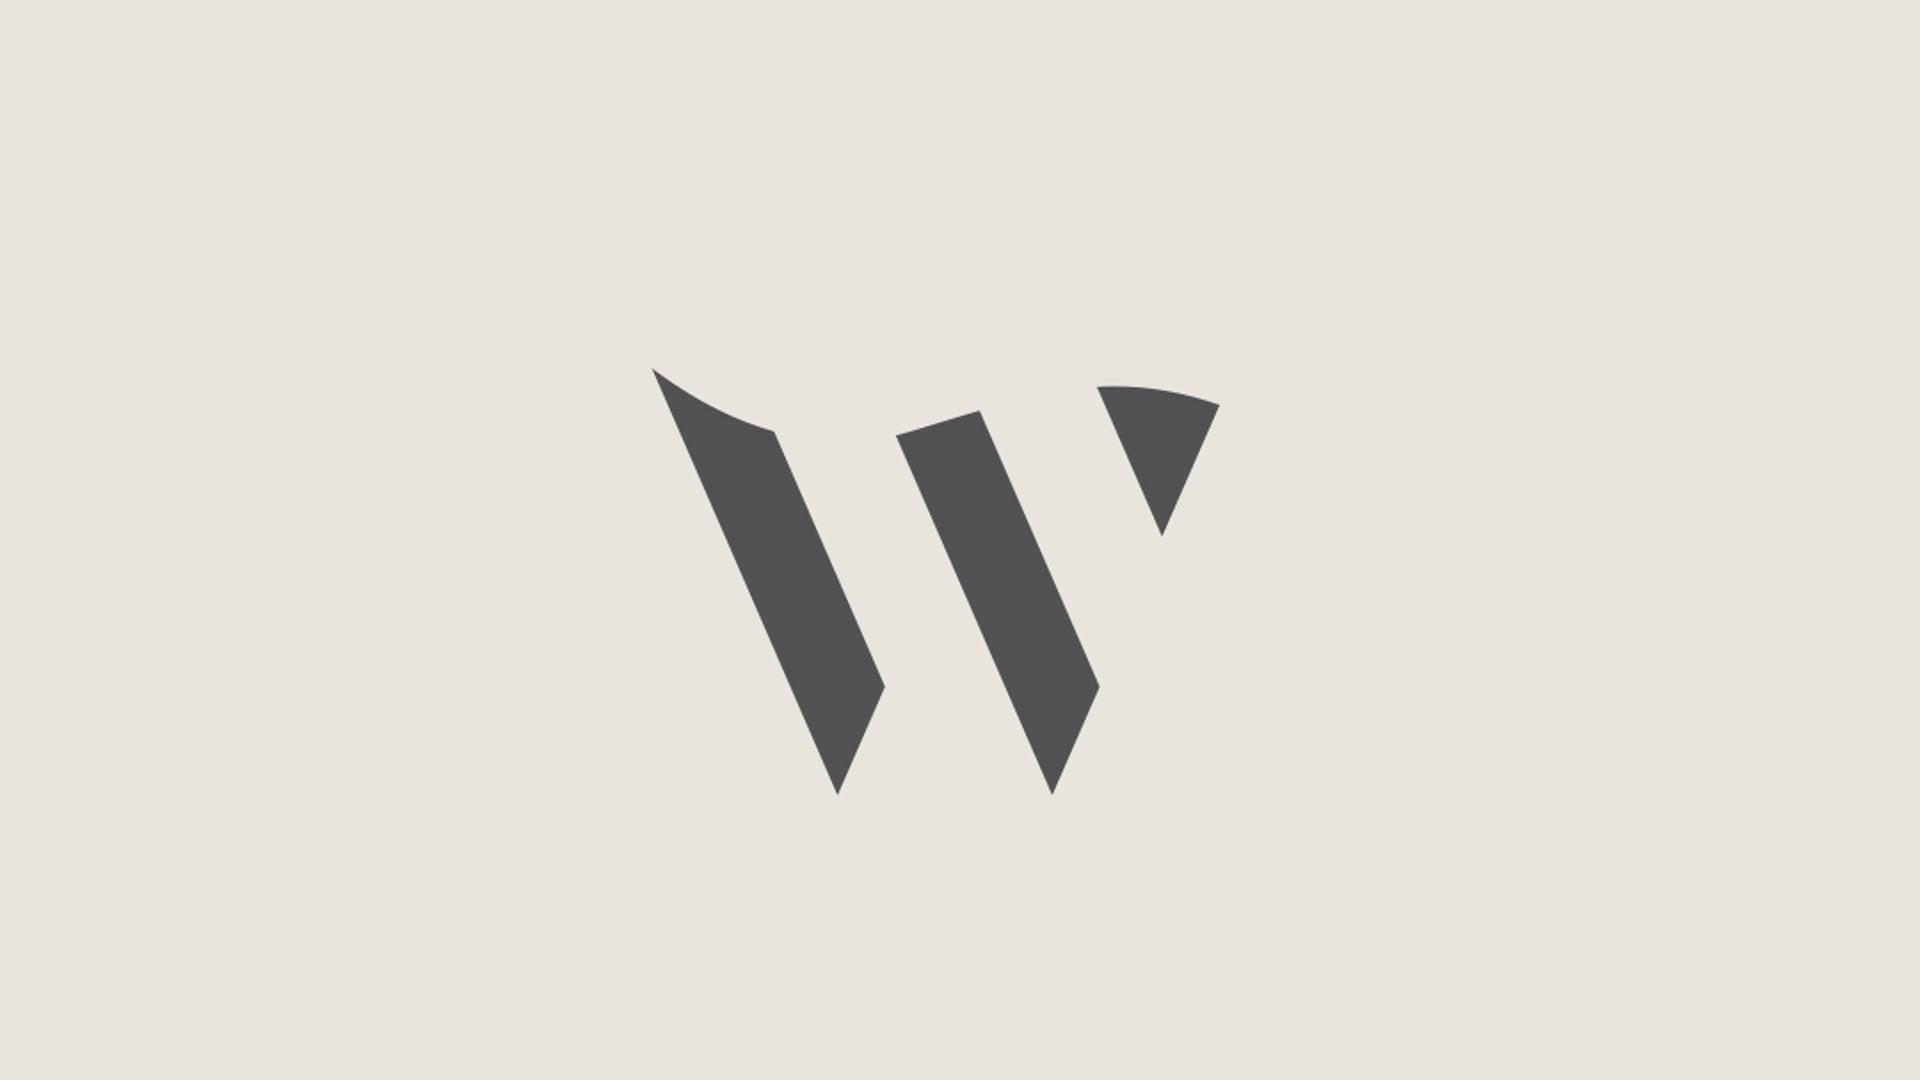 Winefroz 03